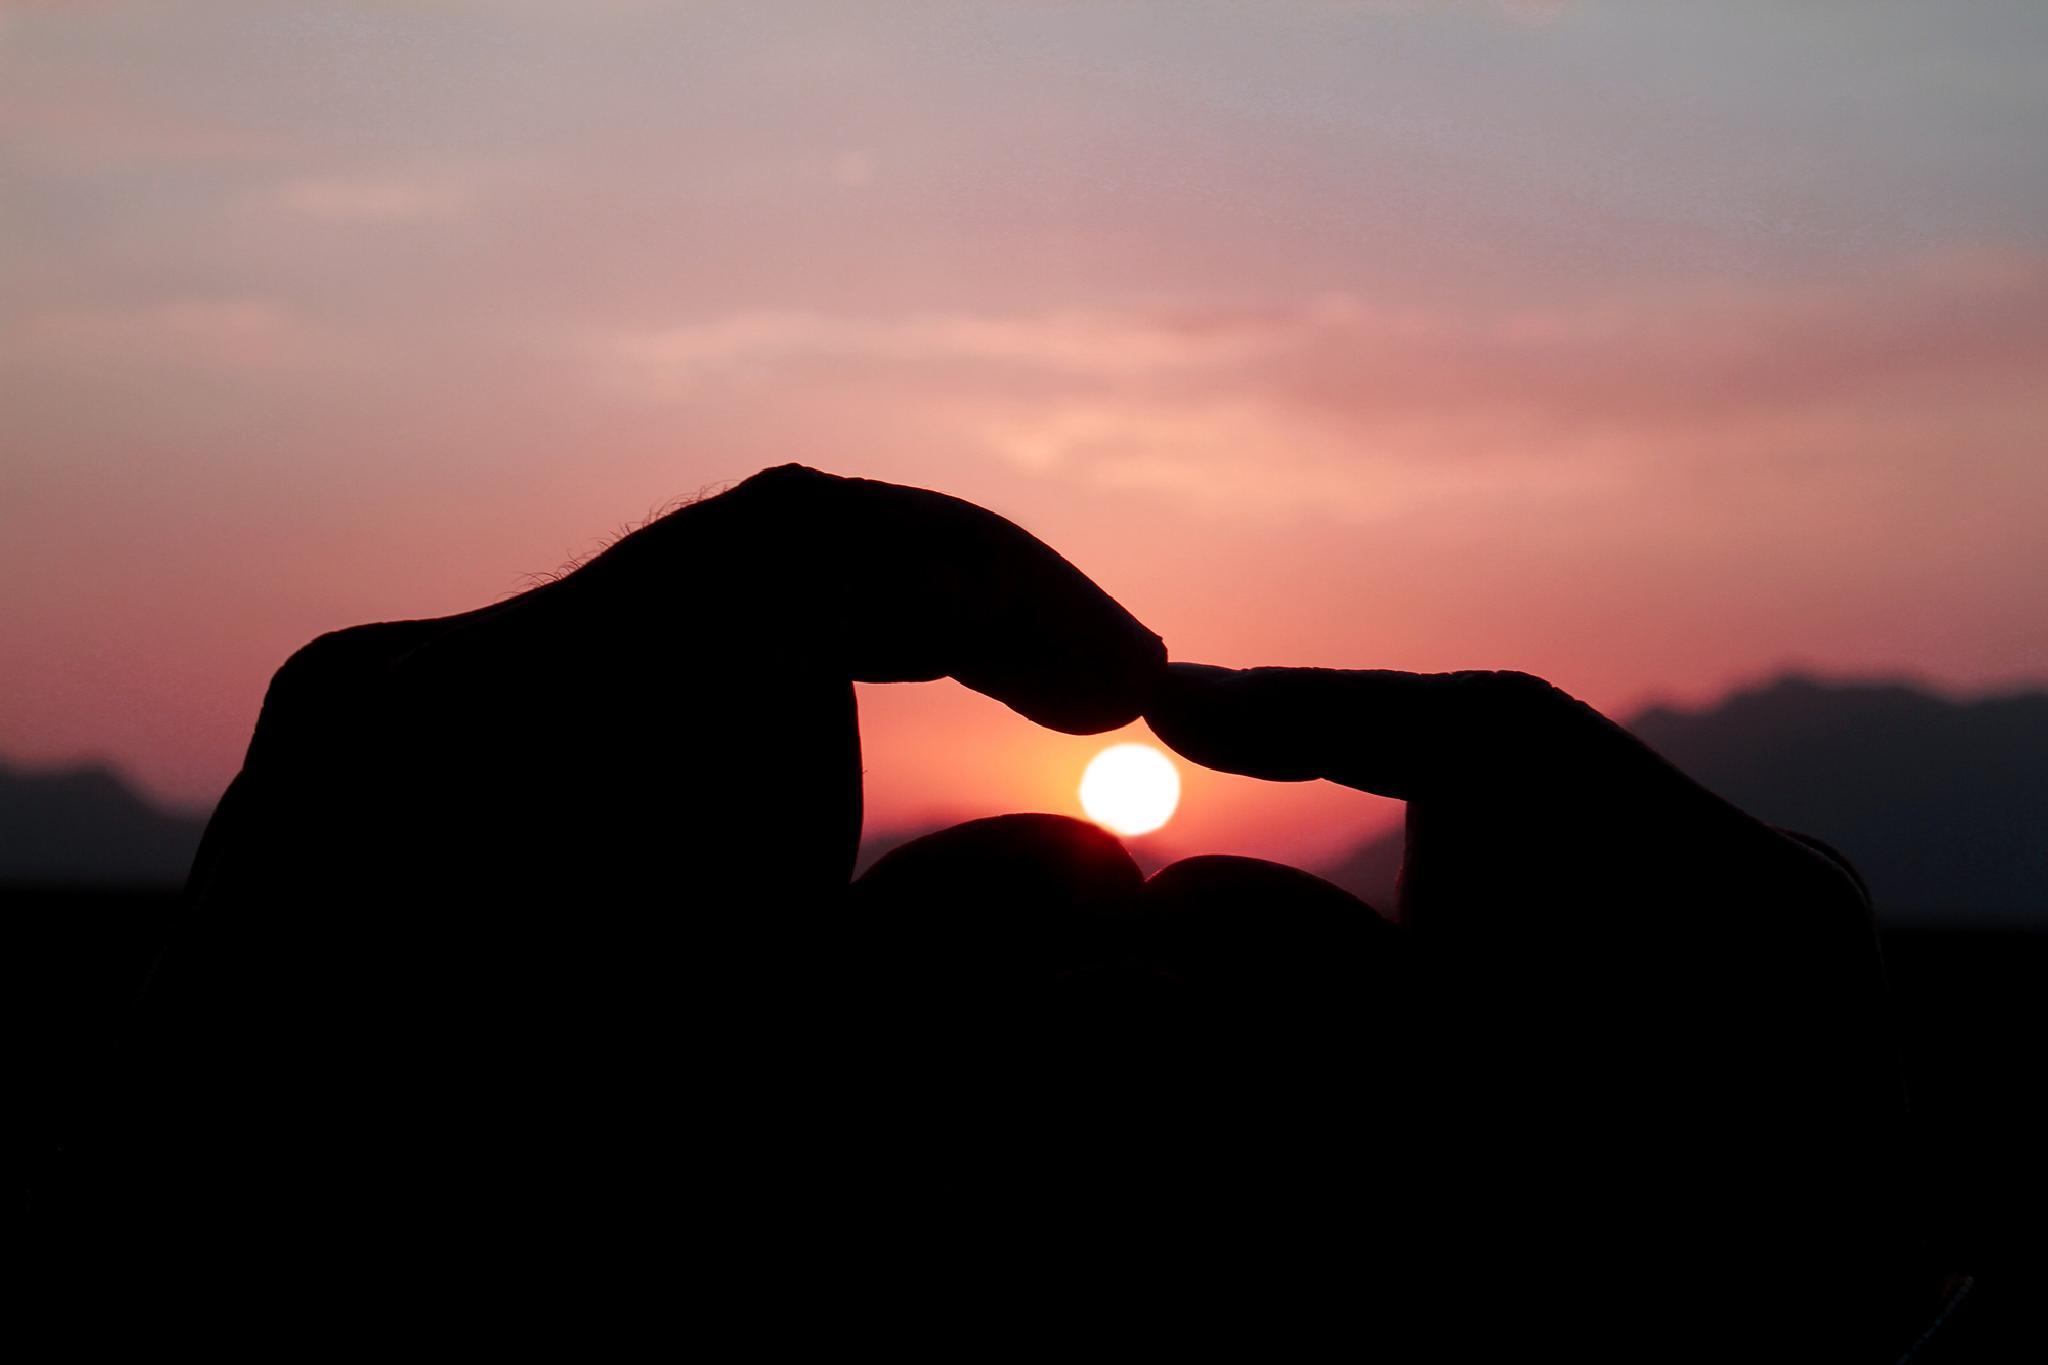 sunset3 by hojjatnajafi6611